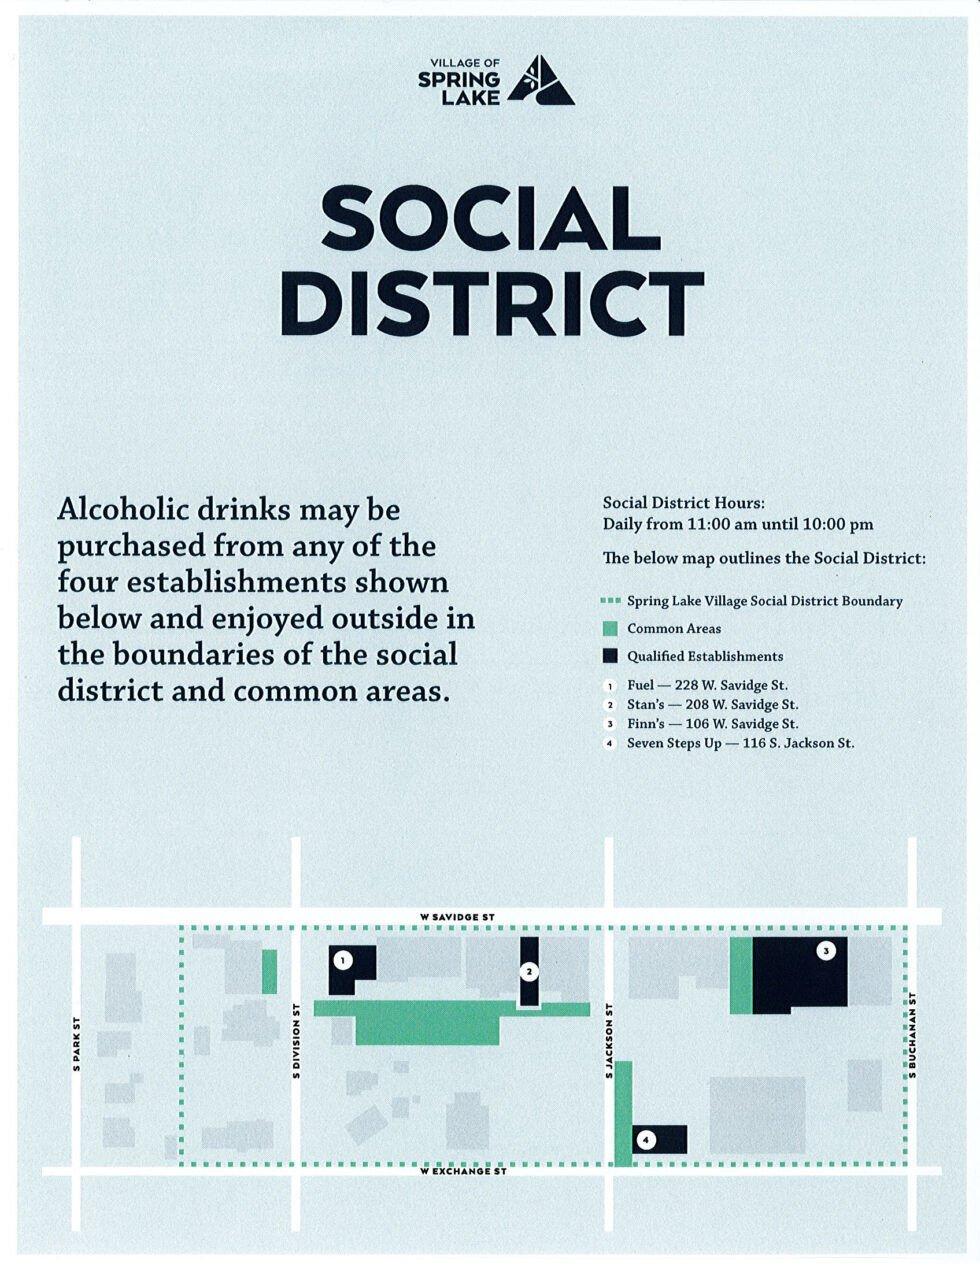 Social District map